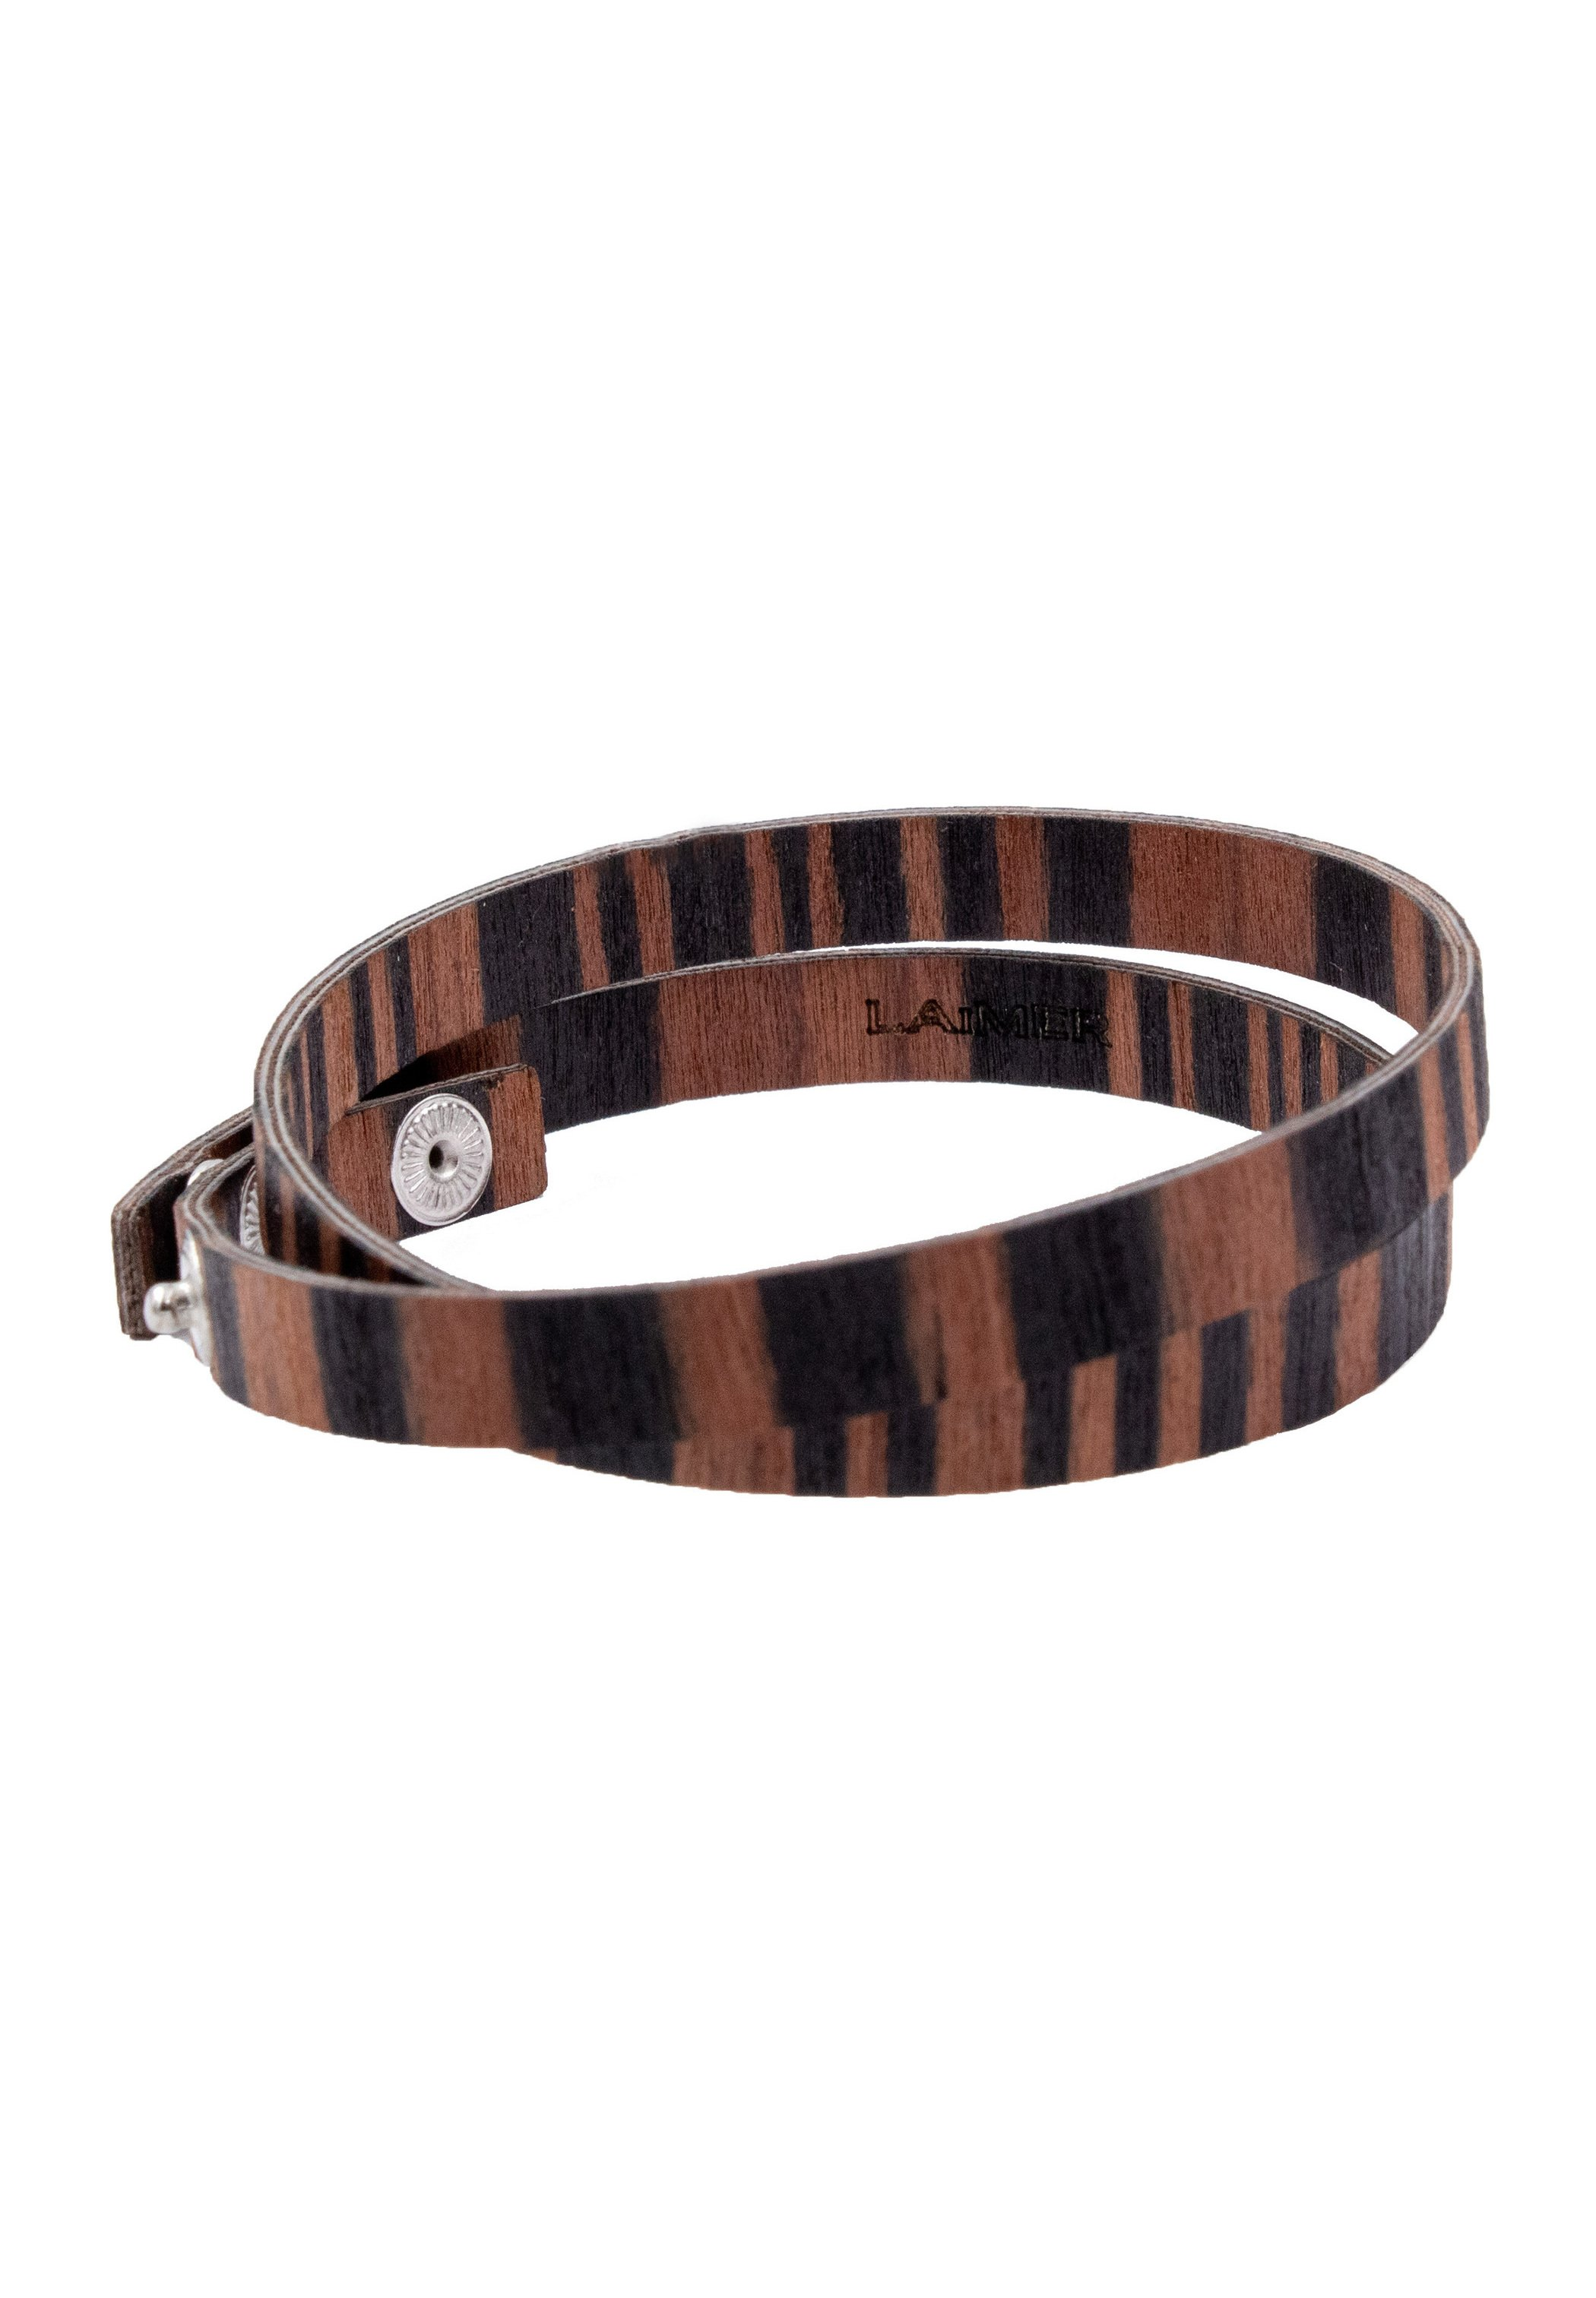 Homme LAiMER Wickel-Armband aus Sandelholz - S1109 - Bracelet